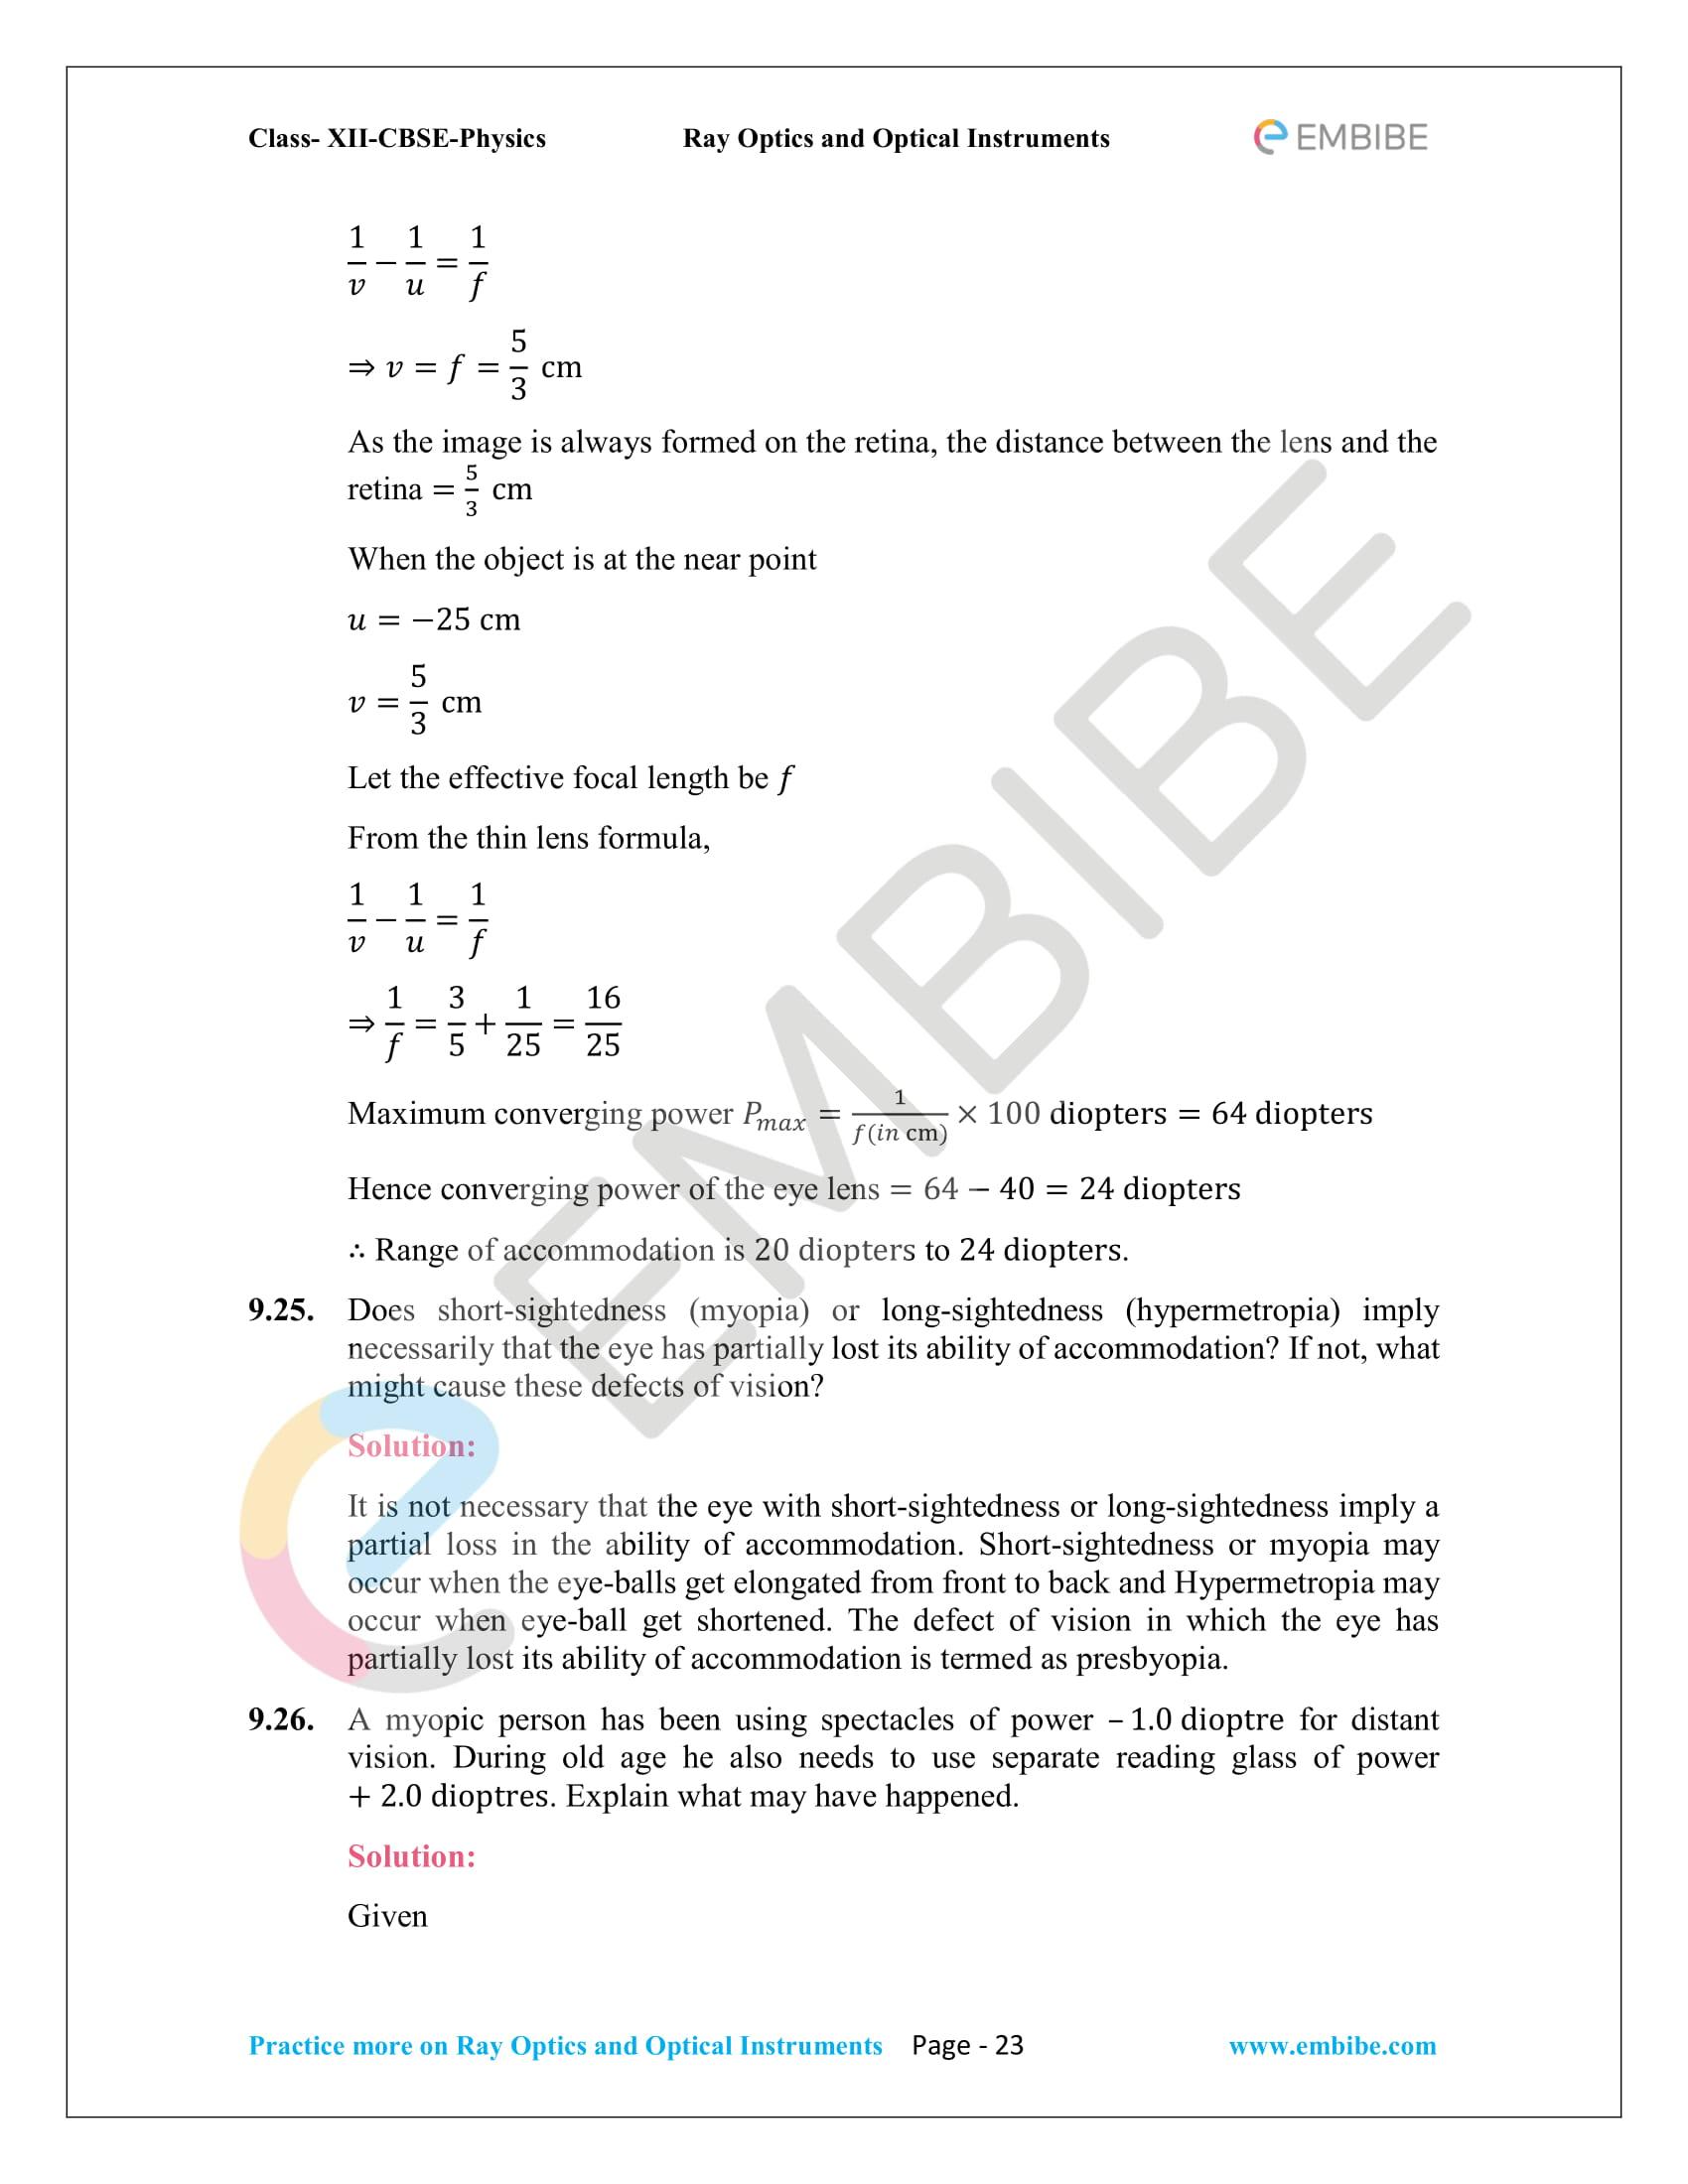 NCERT_Grade 12_Physics_Ch_09_Ray Optics-23